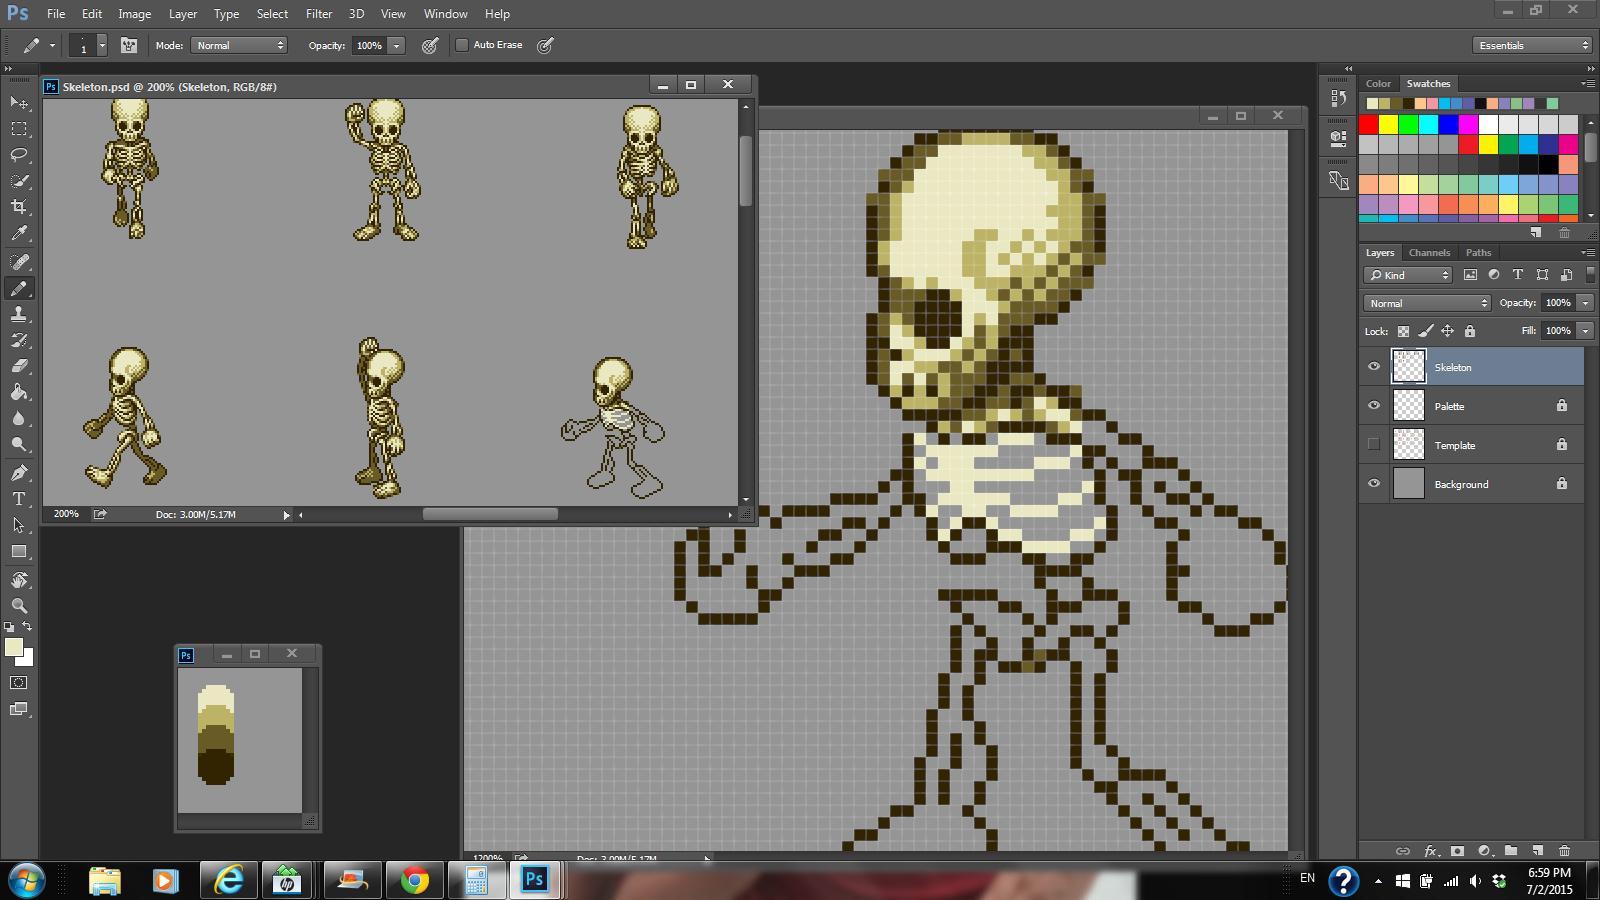 Skeleton sprite sheet work in progress